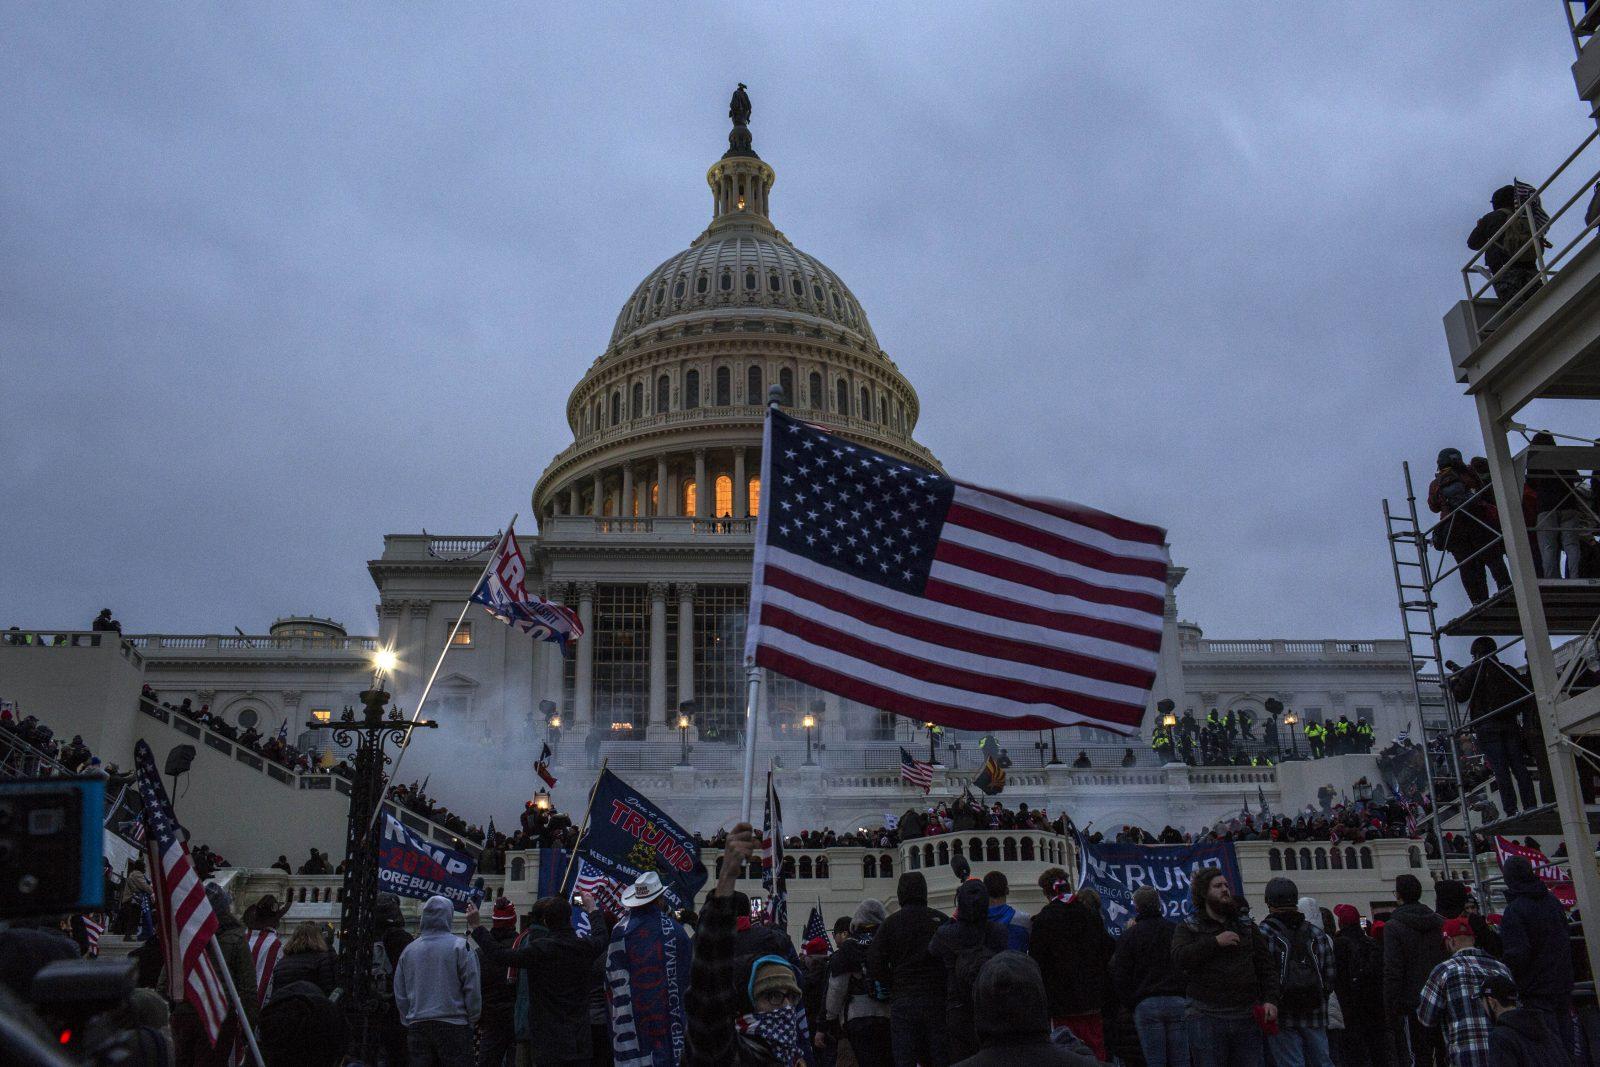 Unterstützer des US-Präsidenten Donald Trump vor dem Kapitol